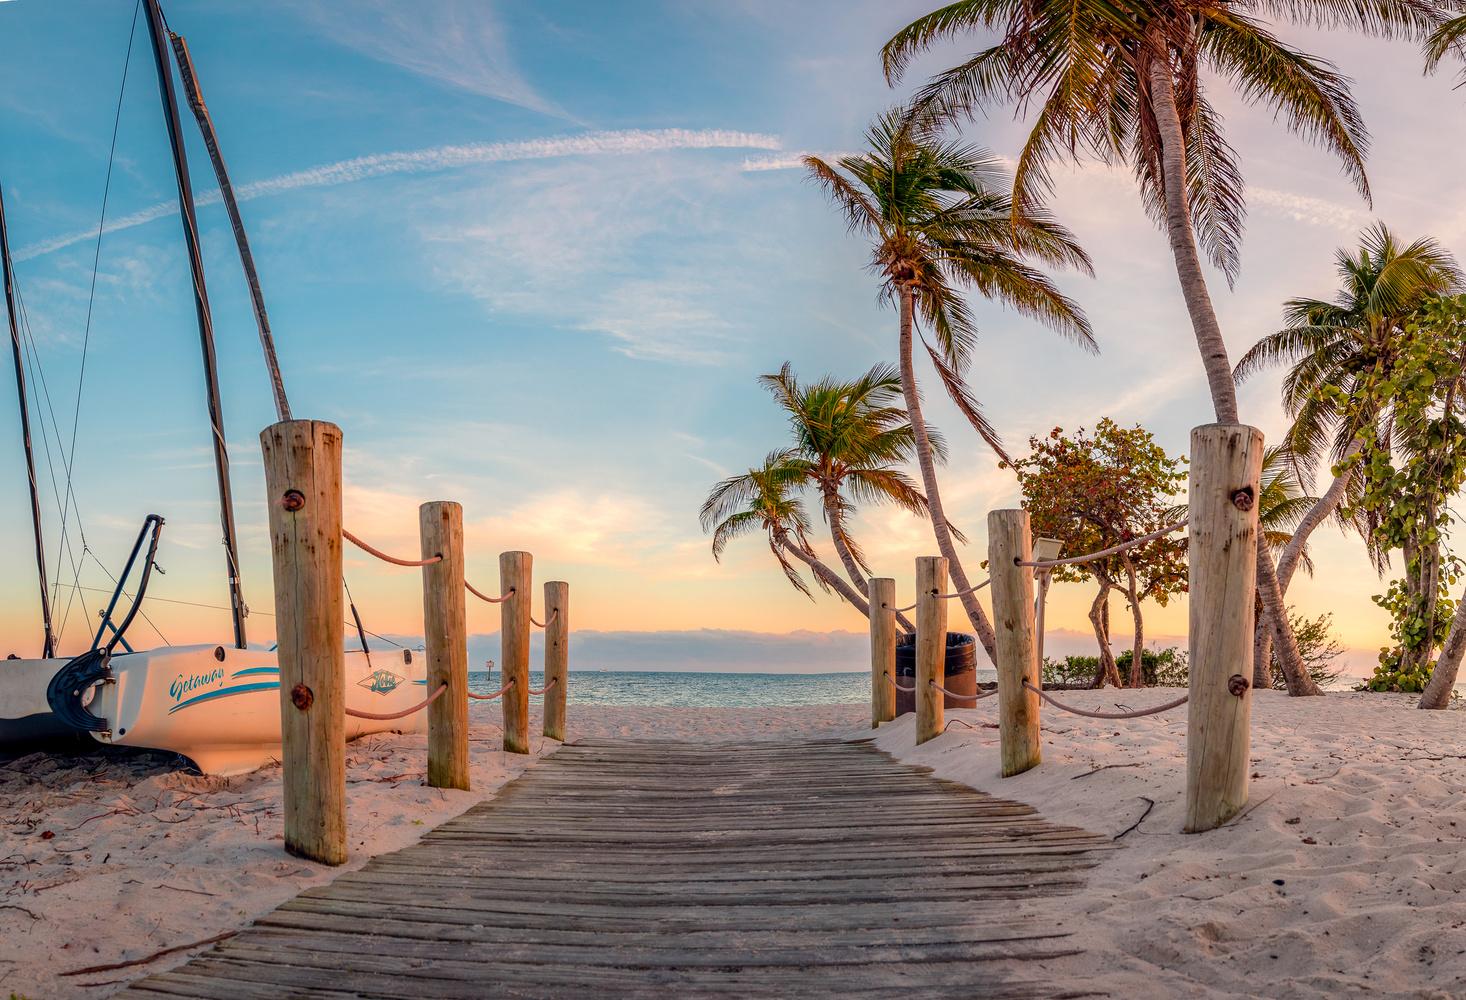 Smathers Beach, Key West by Ovi Mustea